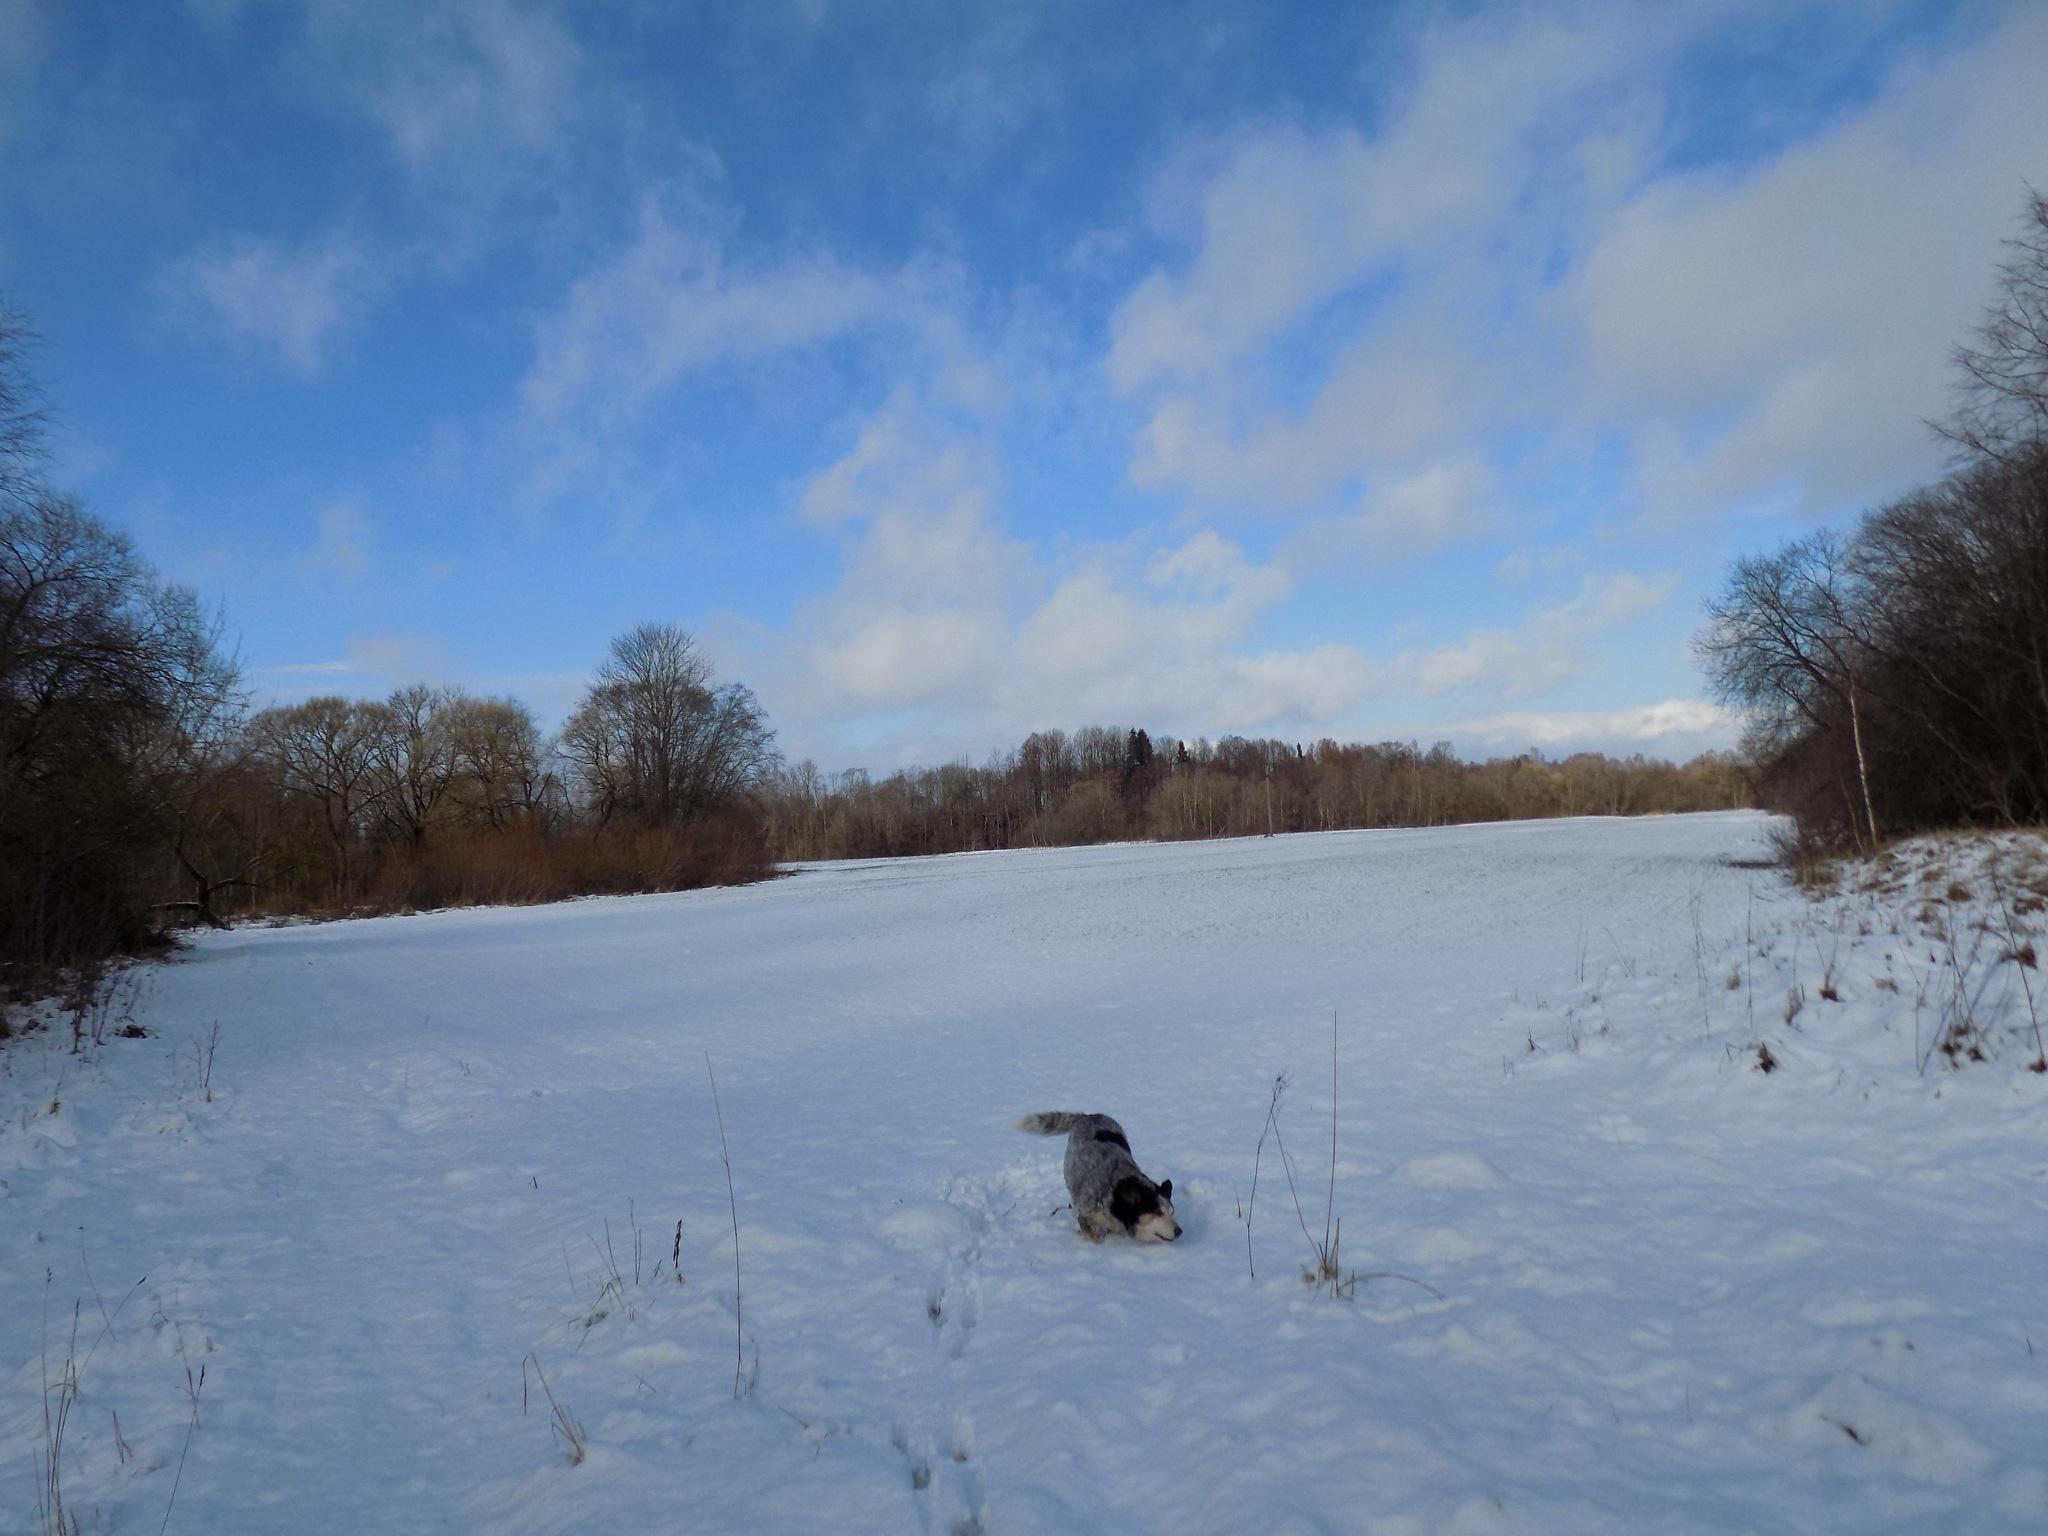 In the winter day by uzkuraitiene62